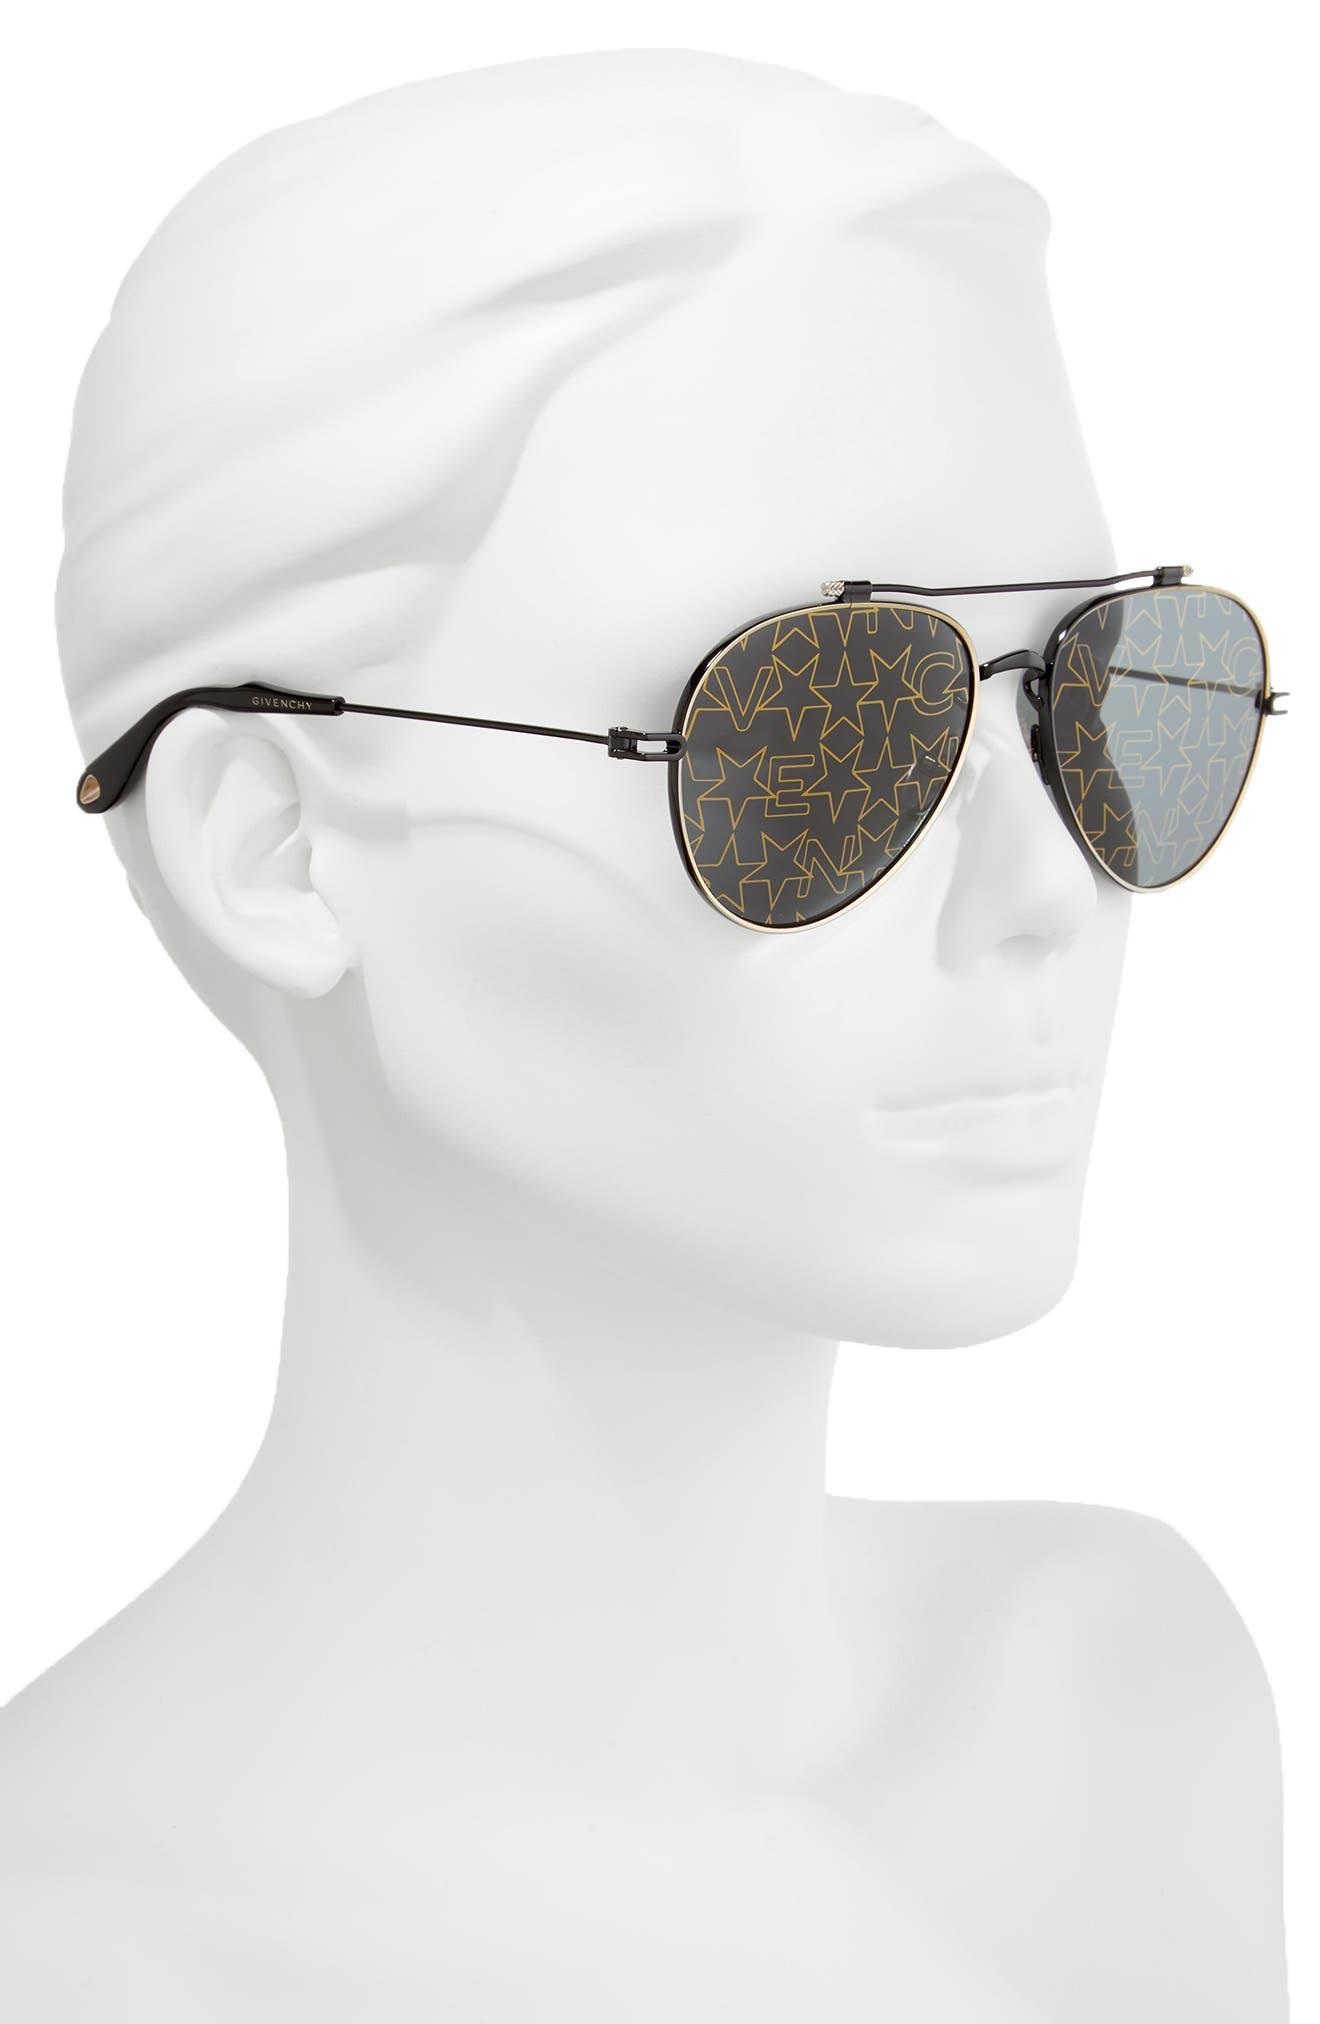 58mm Aviator Sunglasses,                             Alternate thumbnail 2, color,                             001